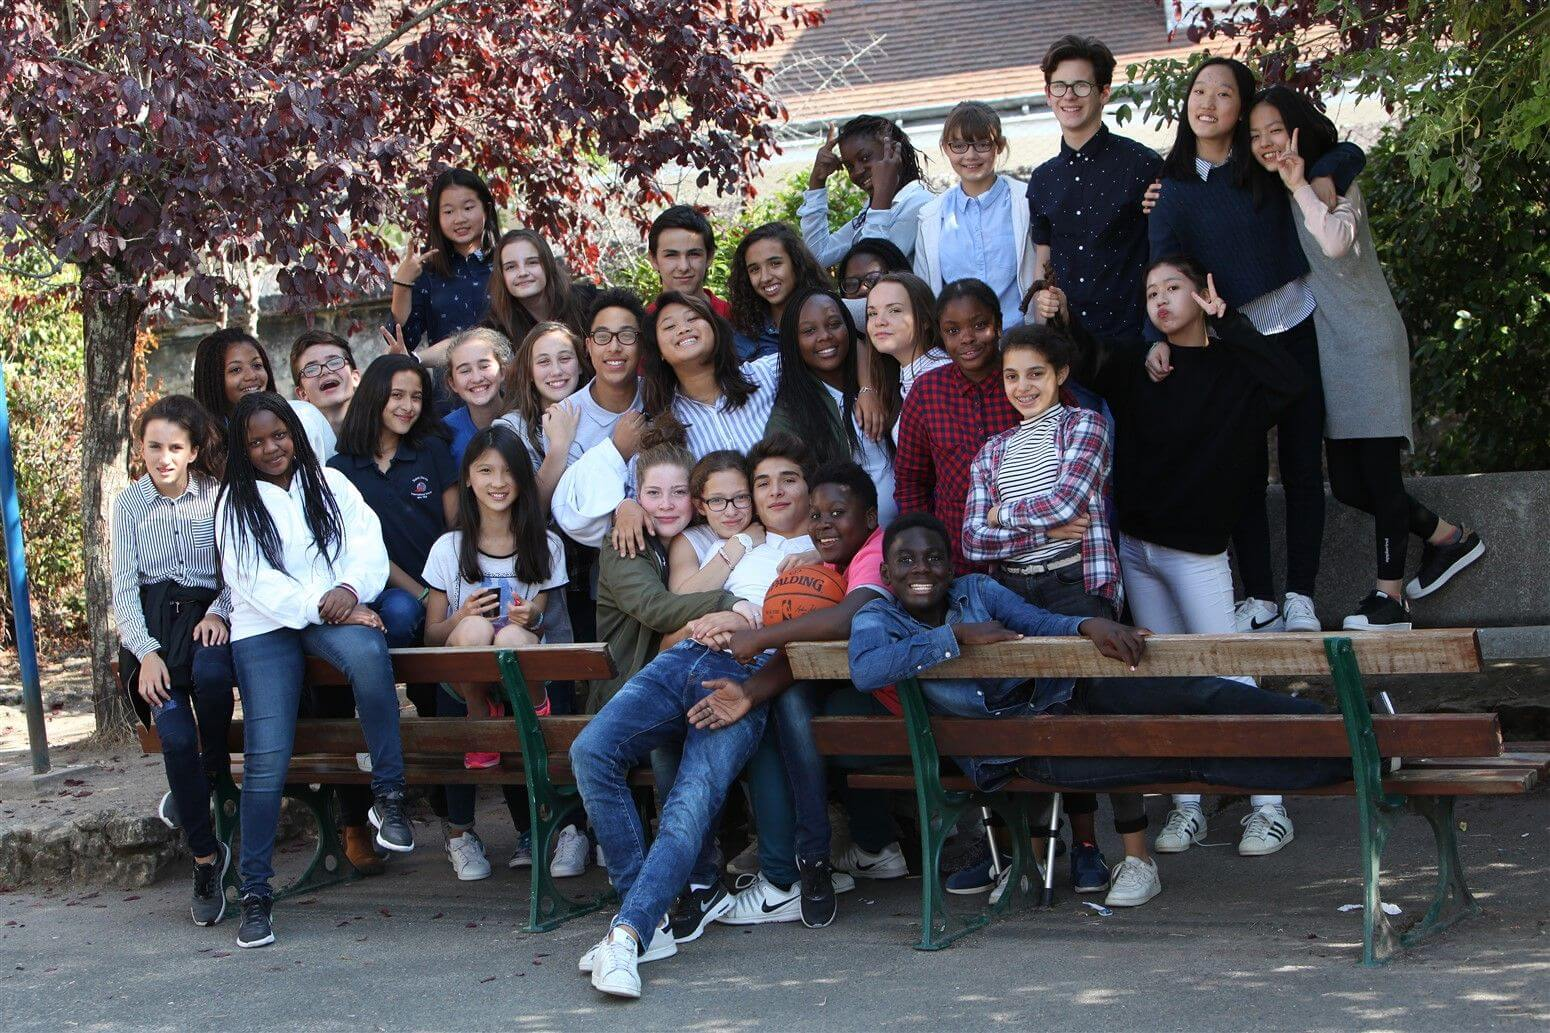 4 European international schools, 4 pathways to international success